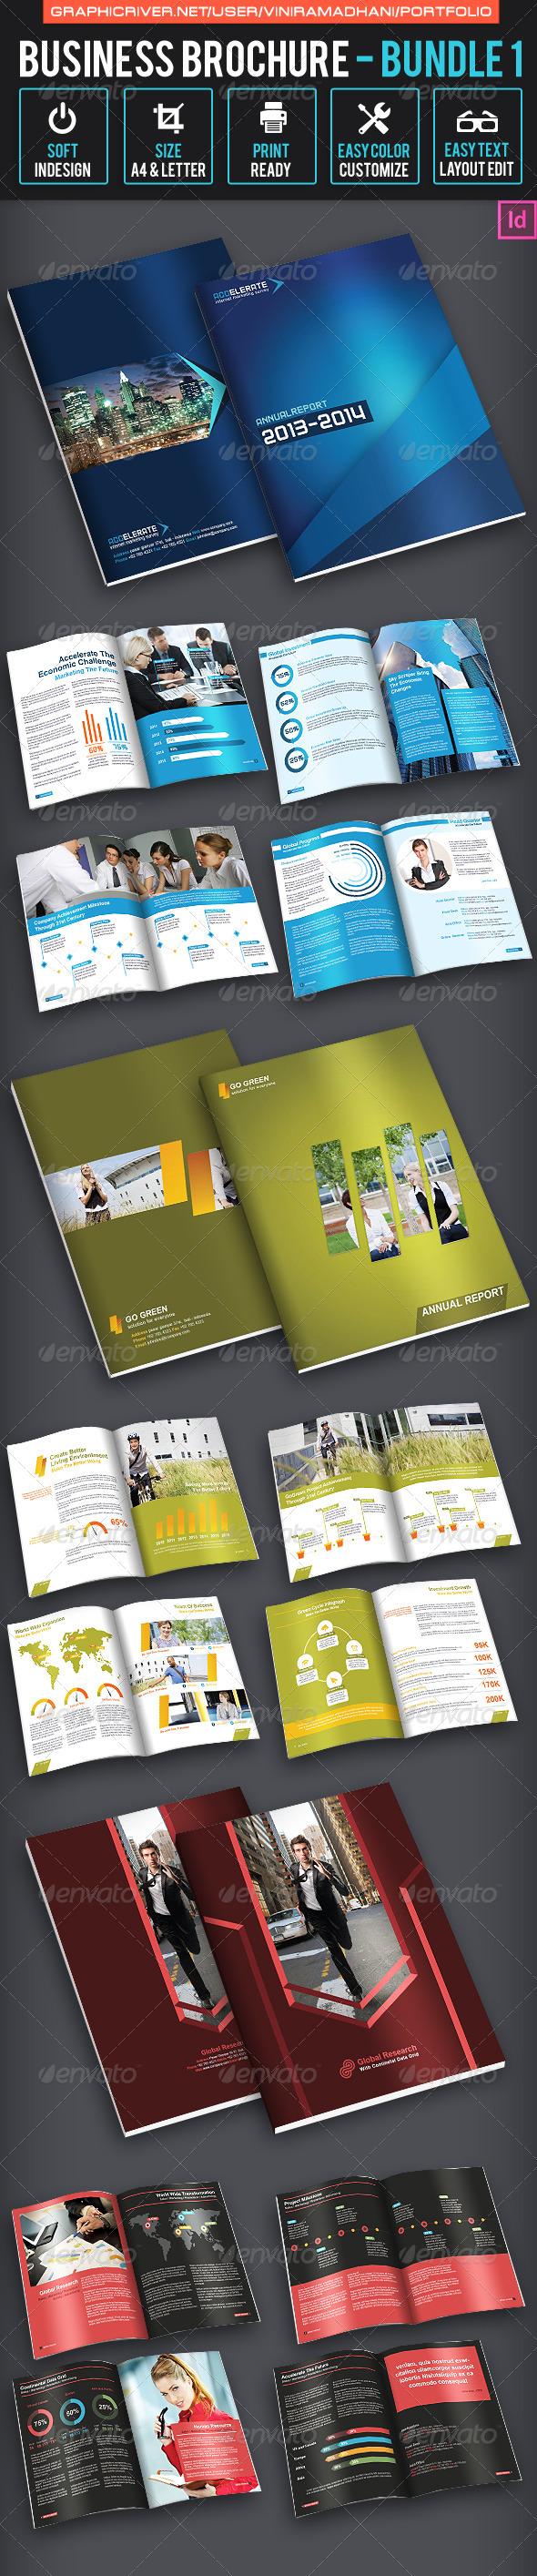 GraphicRiver Business Brochure Bundle 1 7023341